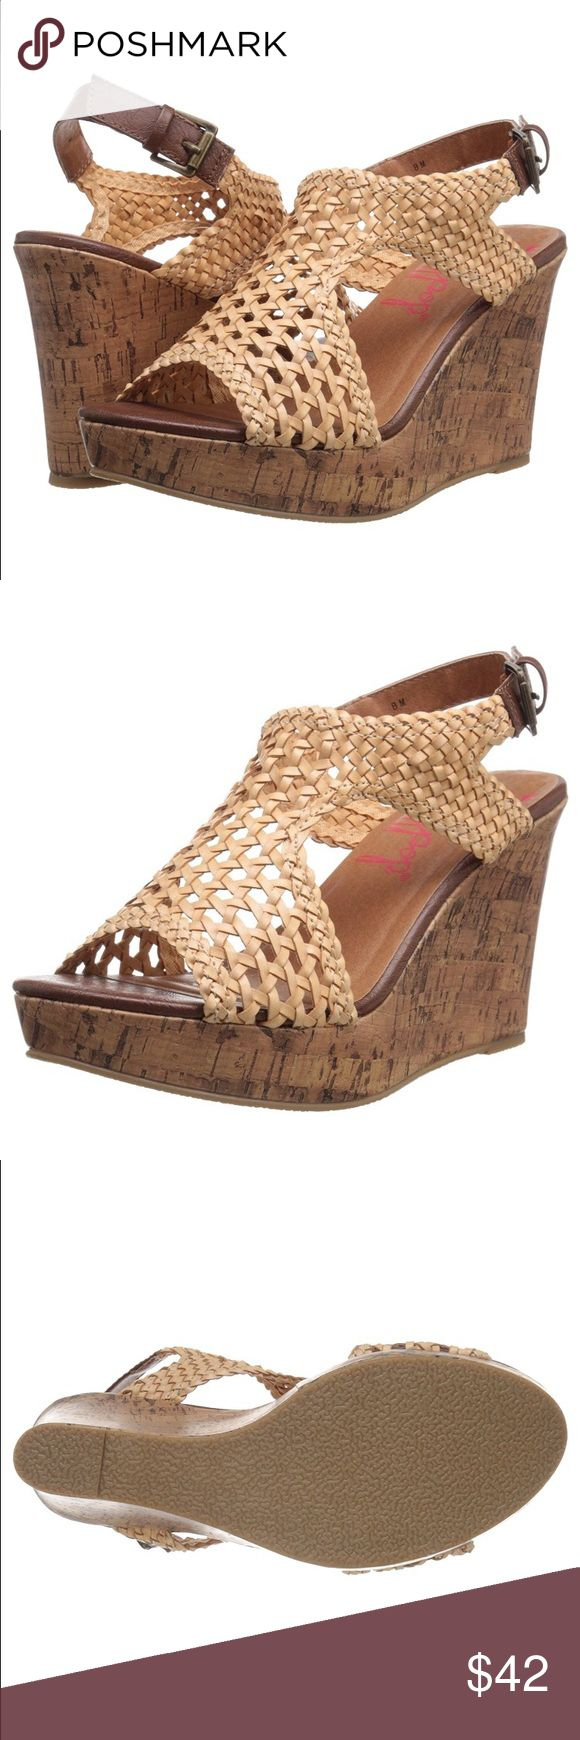 Women's Jellypop Wedge Sandal Woven upper wedge. Cross cross ankle strap. Faux cork wrap wedge Jellypop Shoes Wedges